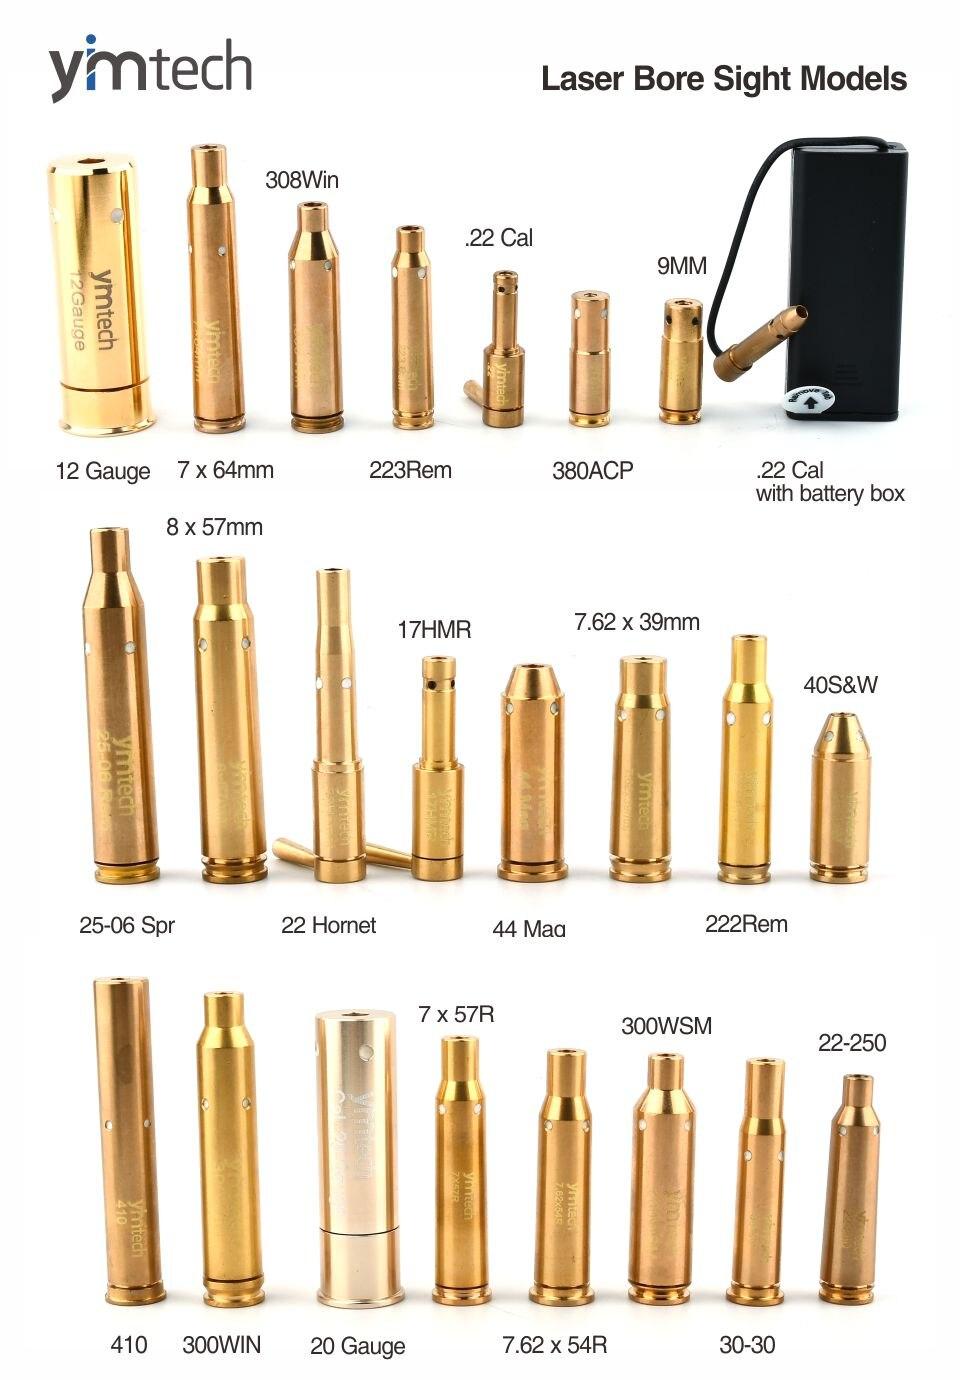 12 gauge 12 ga cartucho laser boresight